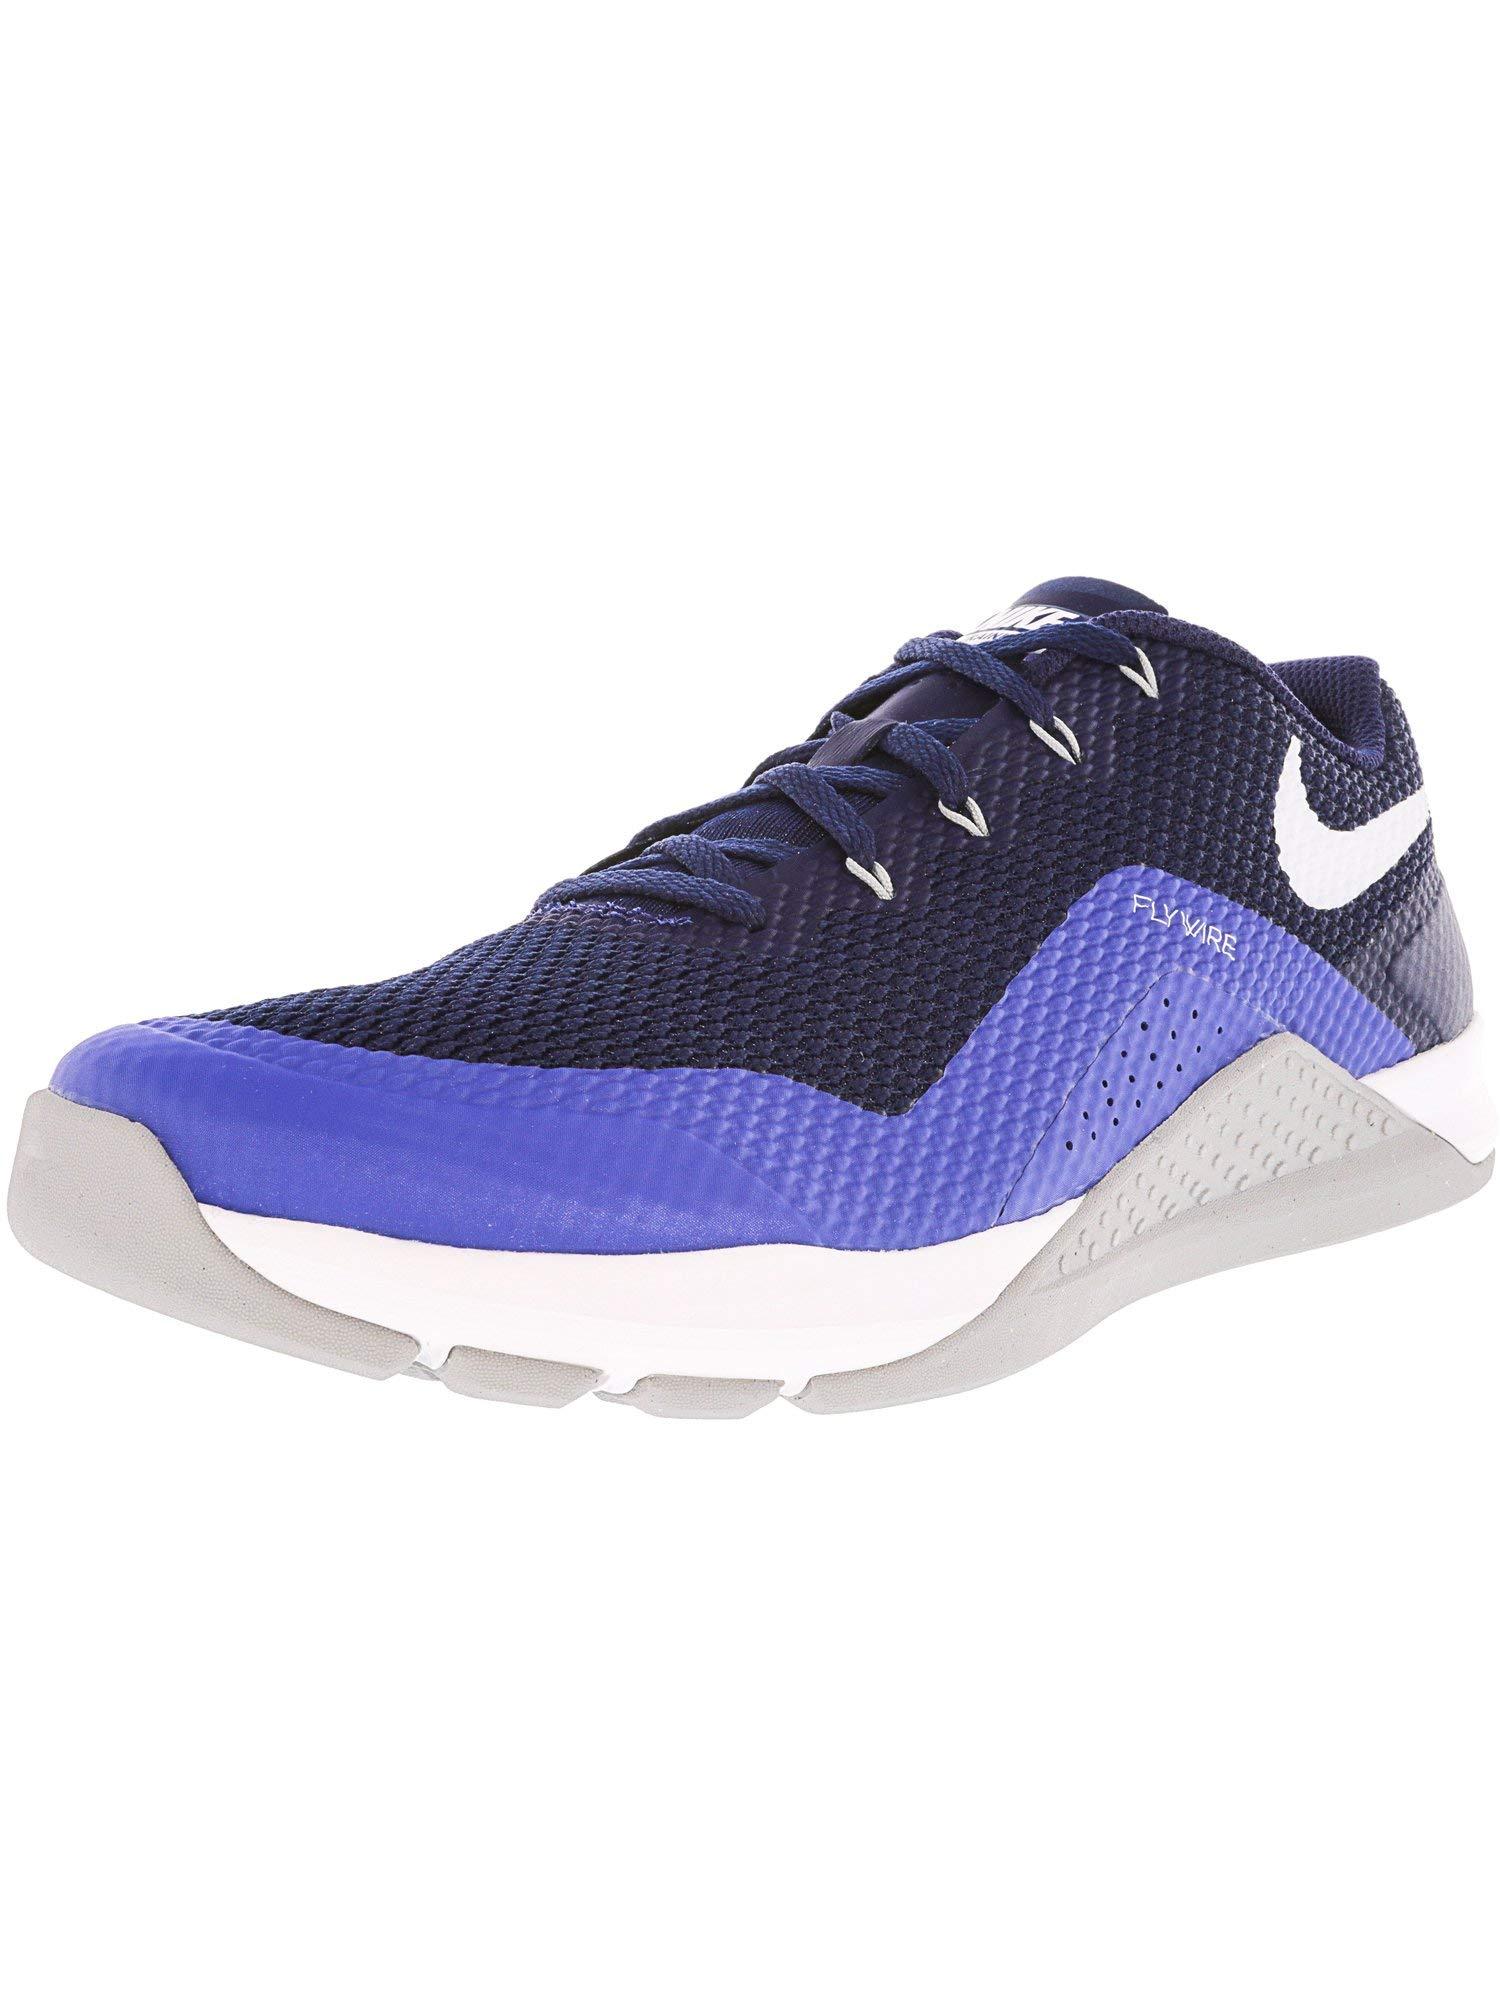 pretty nice d0464 0b109 Galleon - Nike Mens Metcon Repper DSX Training Shoe, Binary Blue Paramount  Blue Wolf Grey White (9.5)